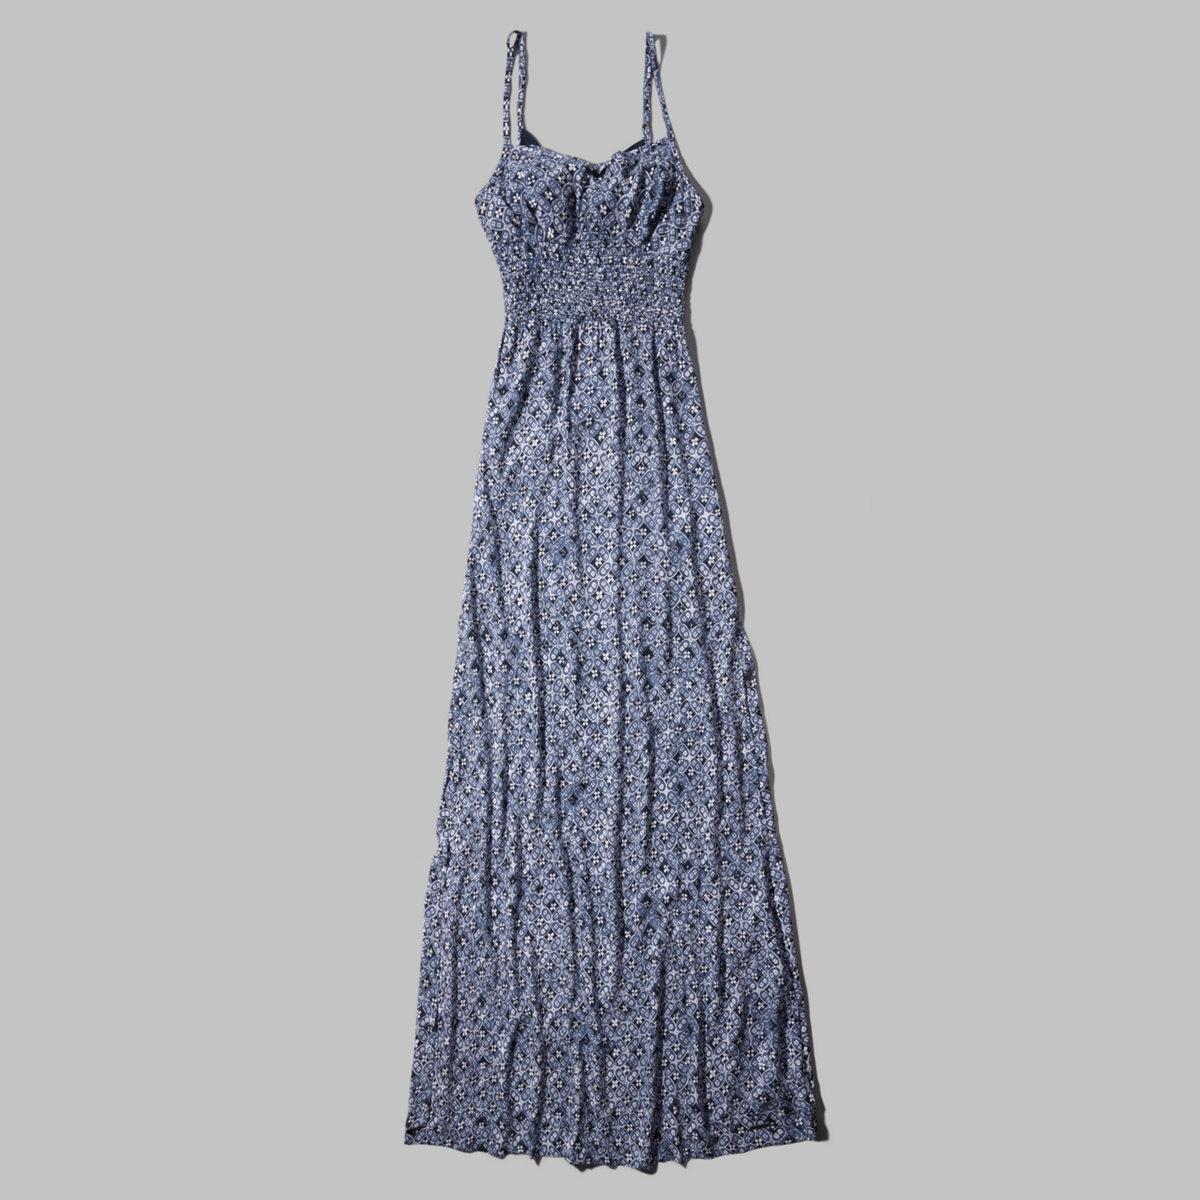 Kaela Maxi Dress